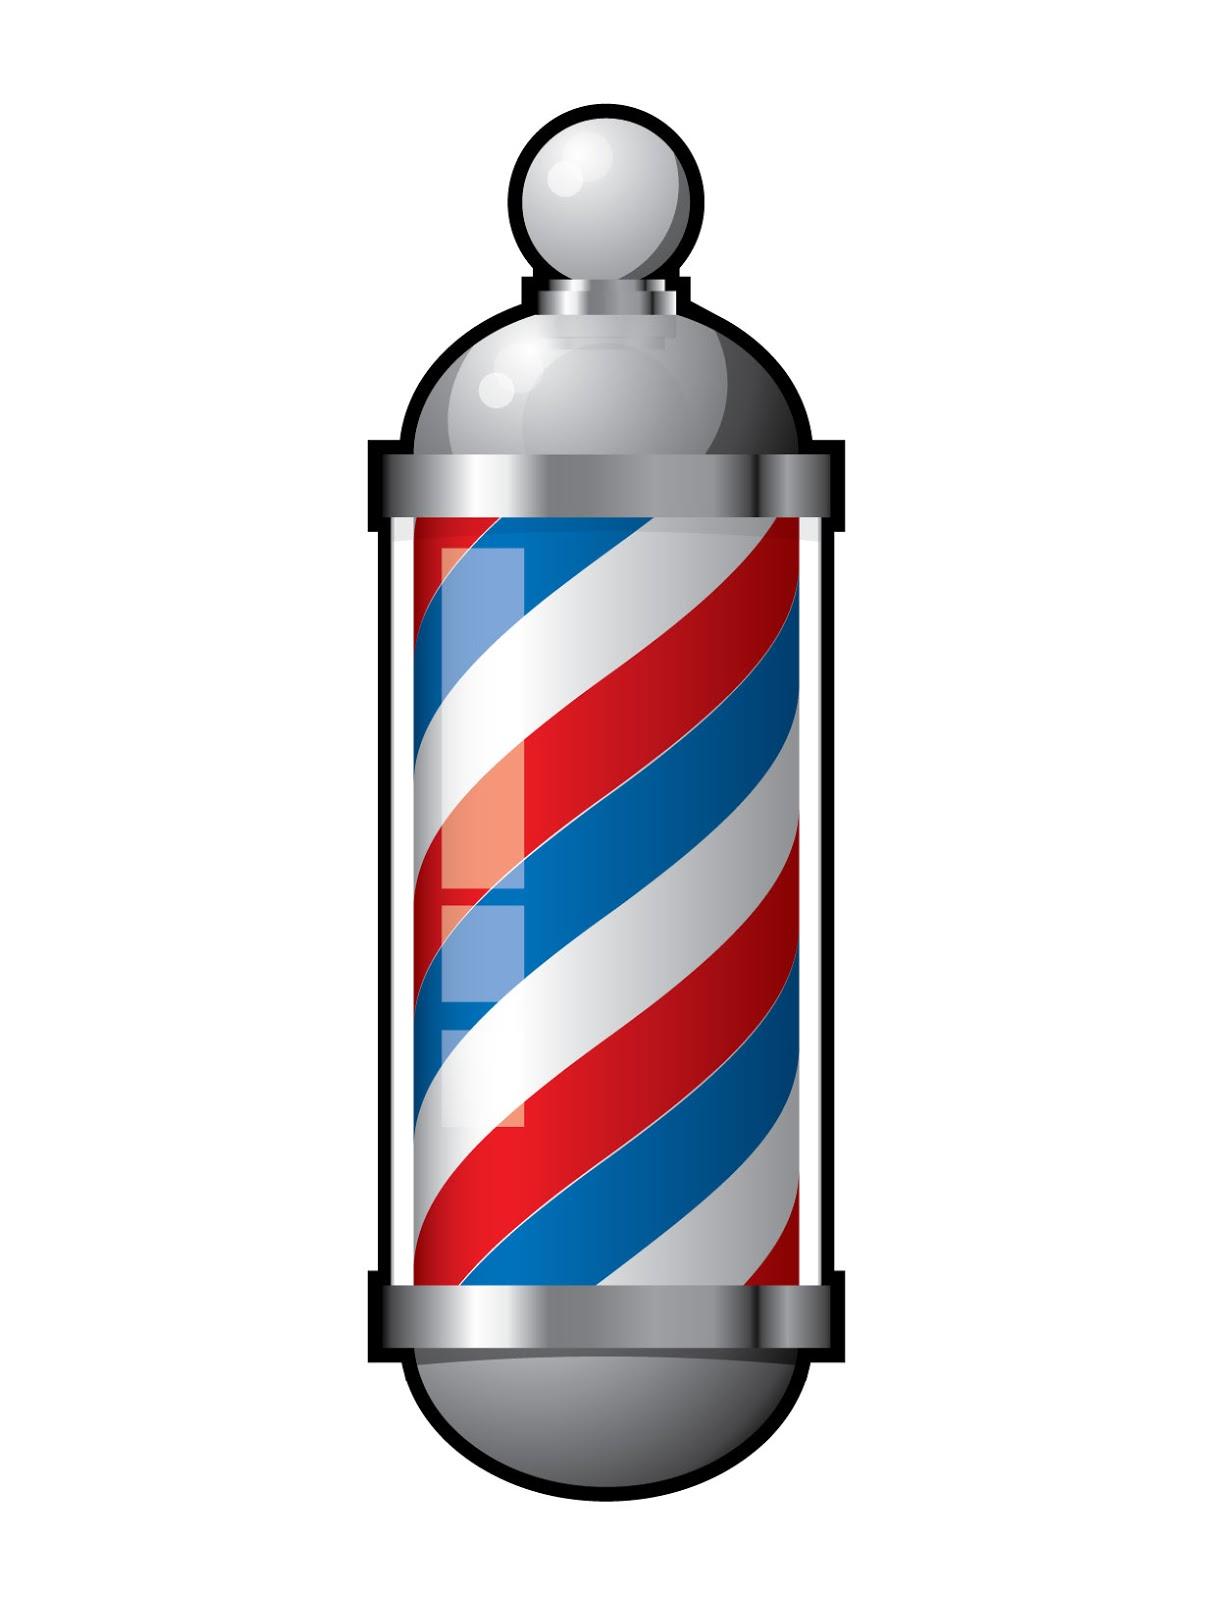 Barber Road Storage : Muskoka MTVS2530SE Rosemont Electrical Fireplace Media Mantel Lowes ...